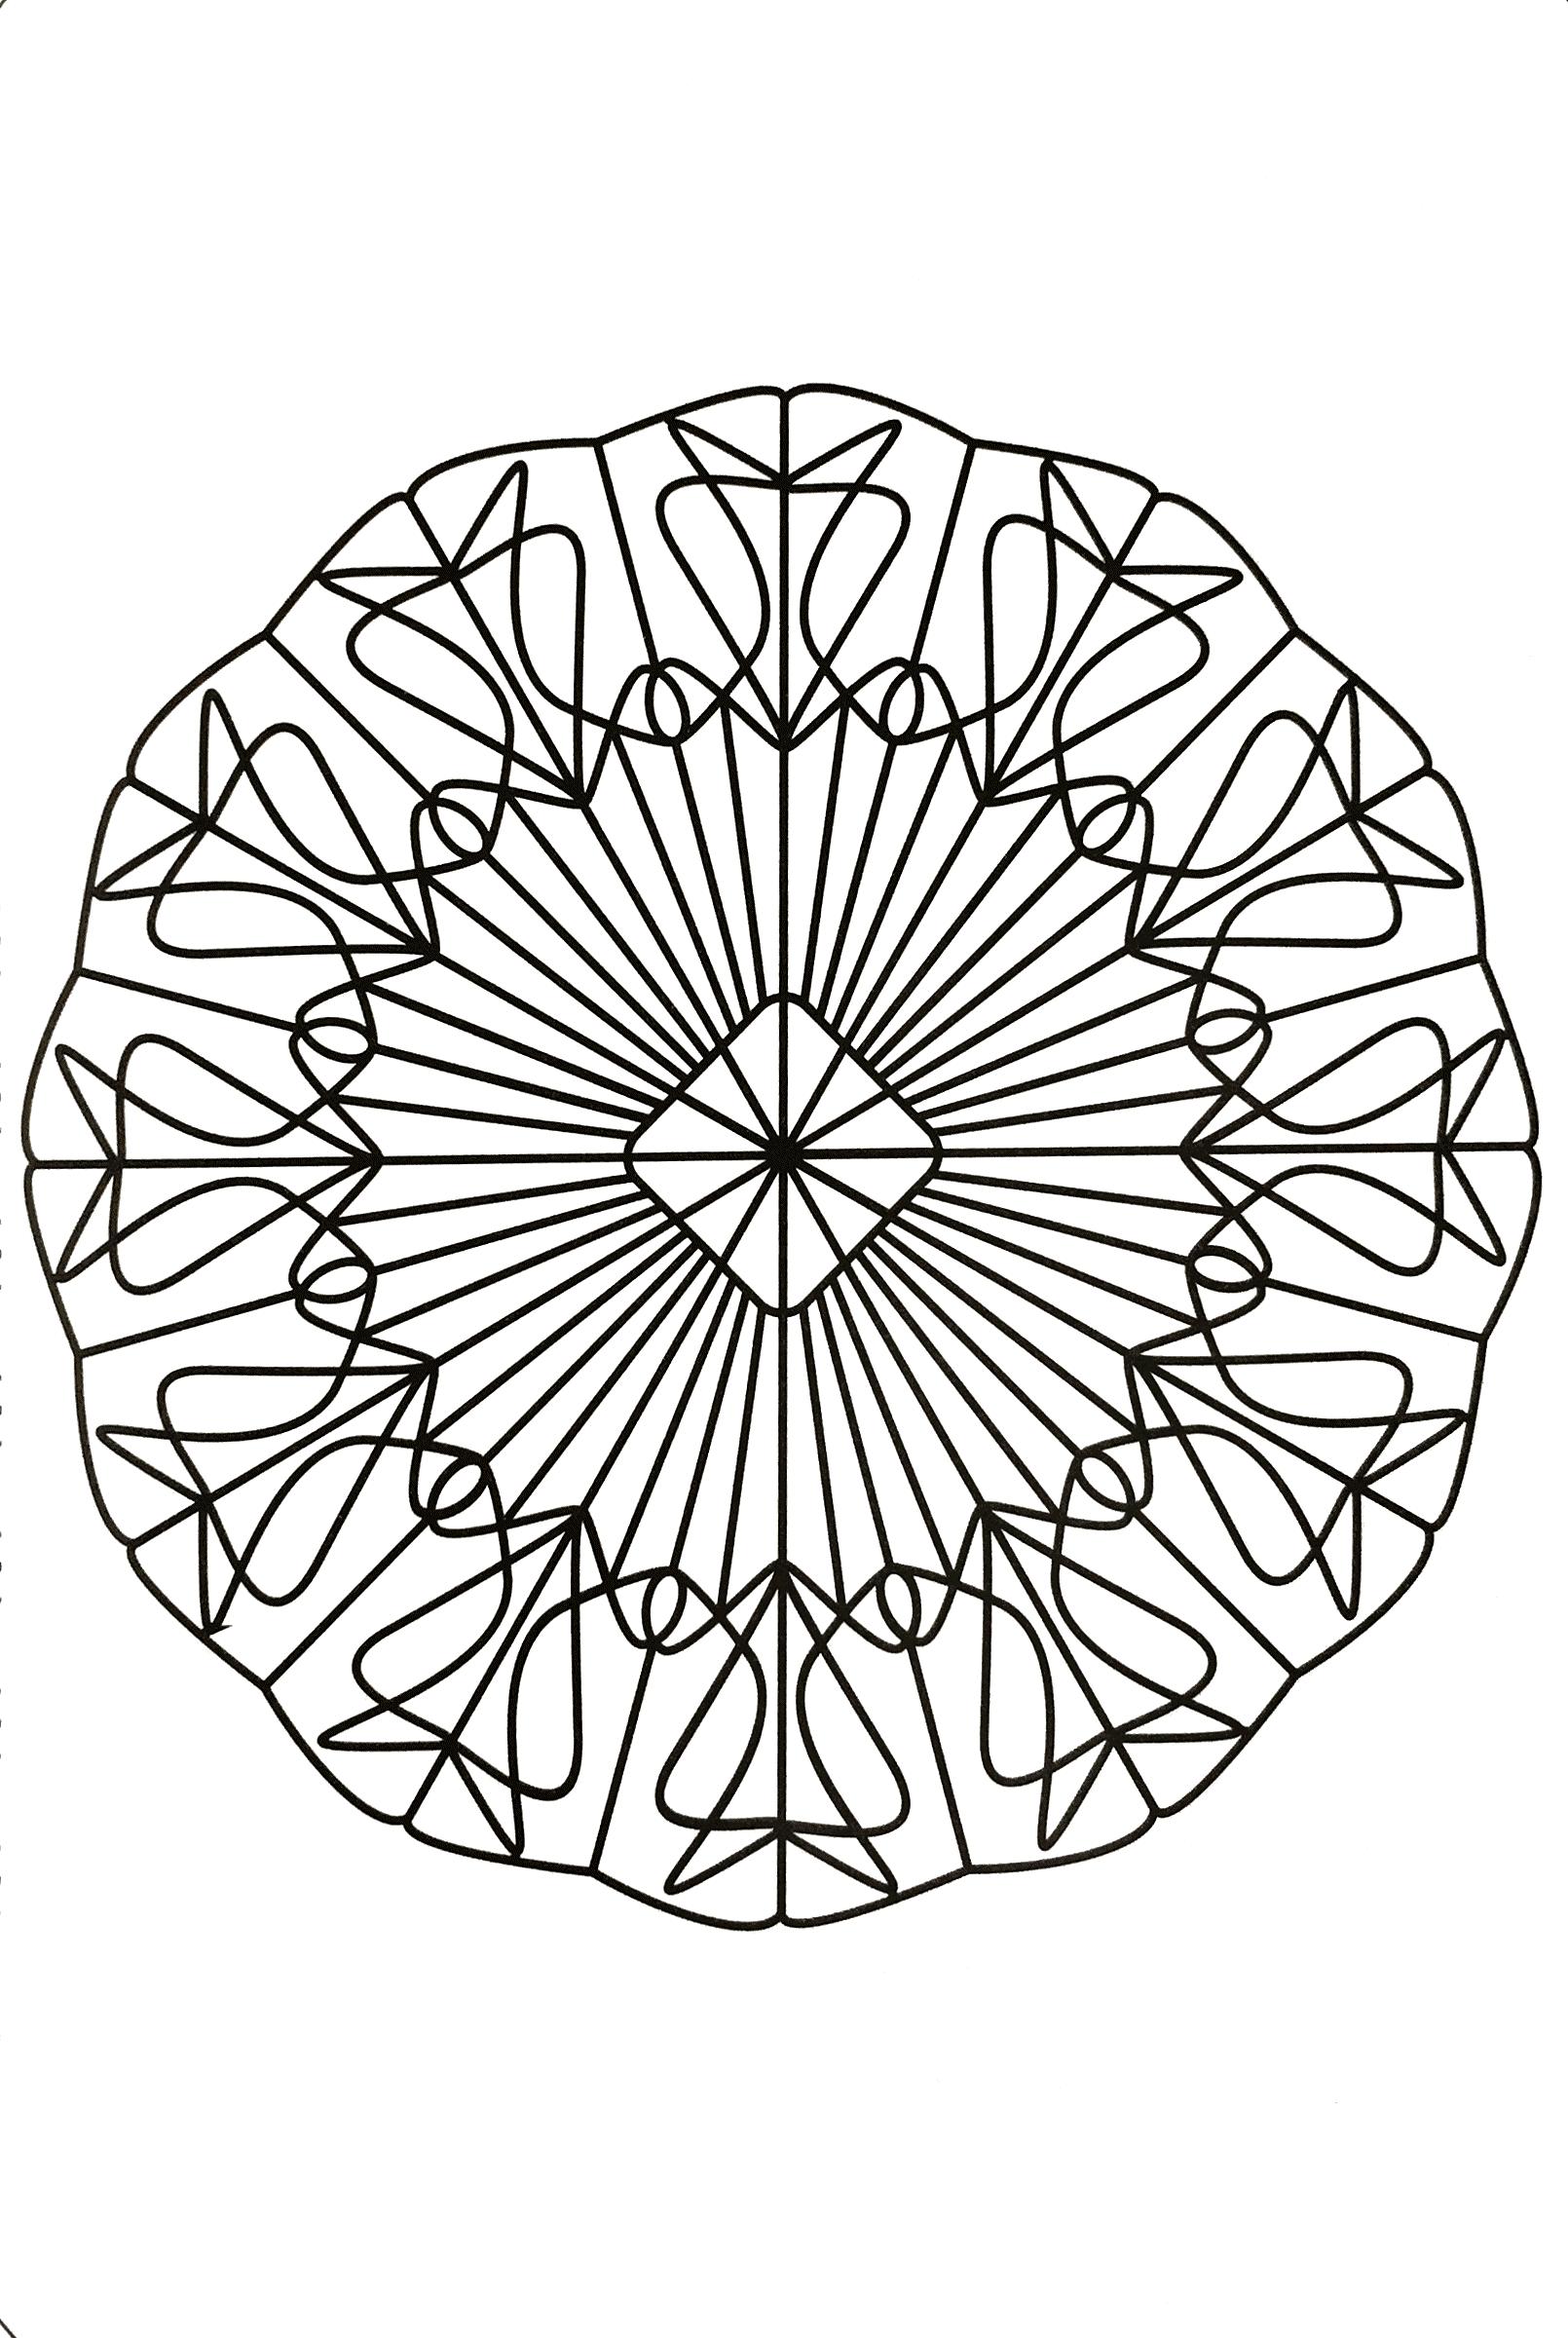 Free coloring page mandalas-to-download-for-free-27. #Mandala ...